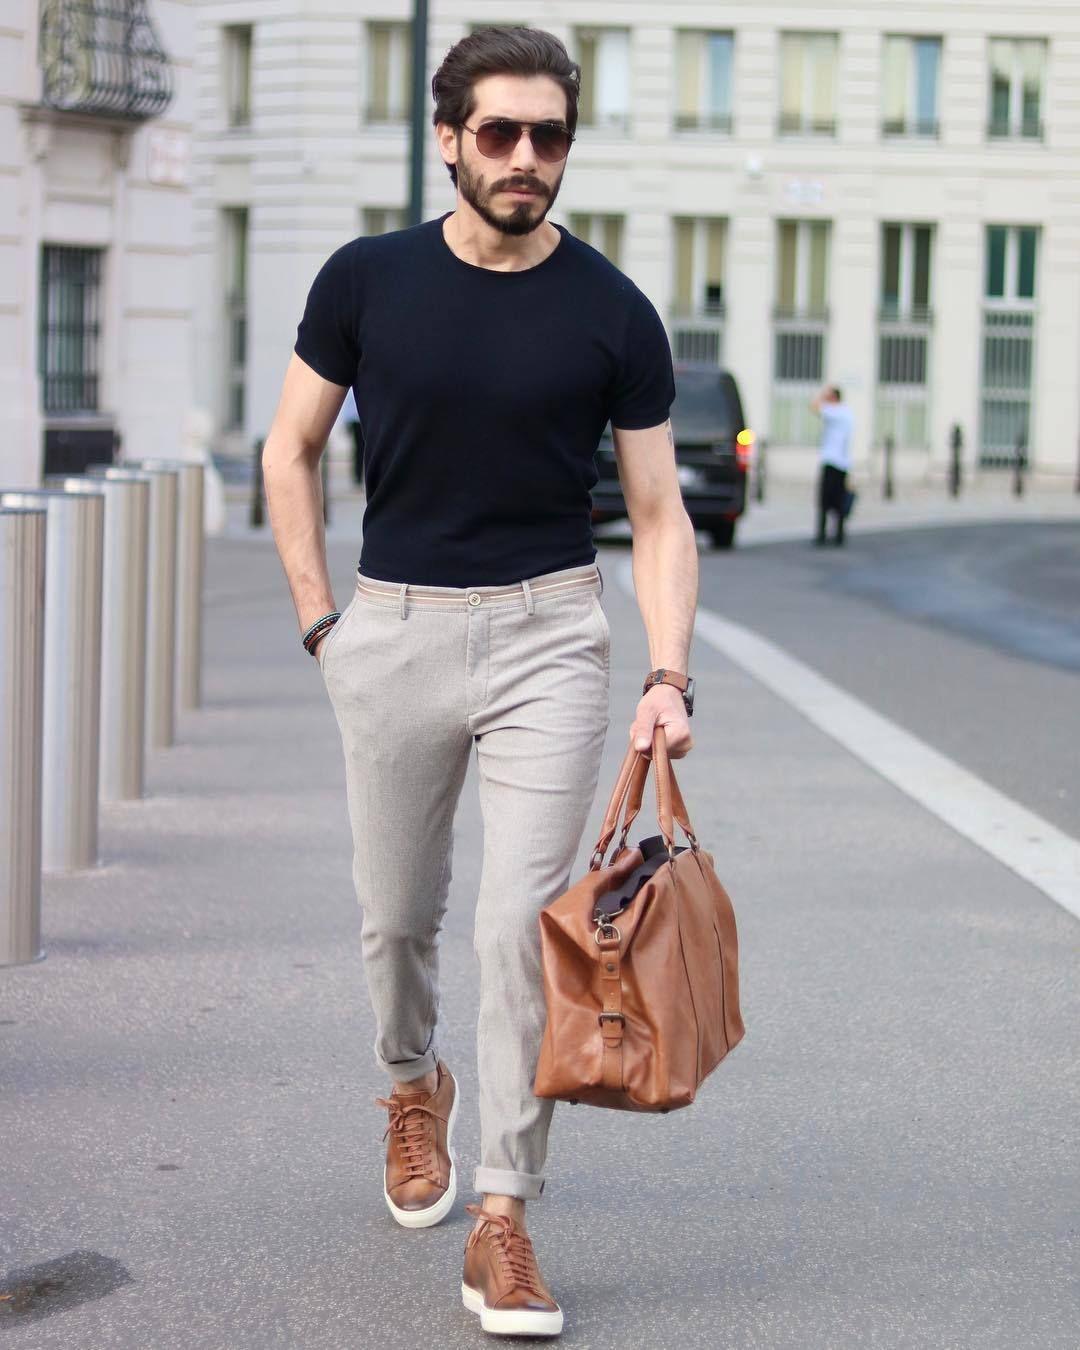 5 Pants T Shirt Outfits For Men Men Fashion Casual Outfits Mens Fashion Casual Outfits Mens Outfits